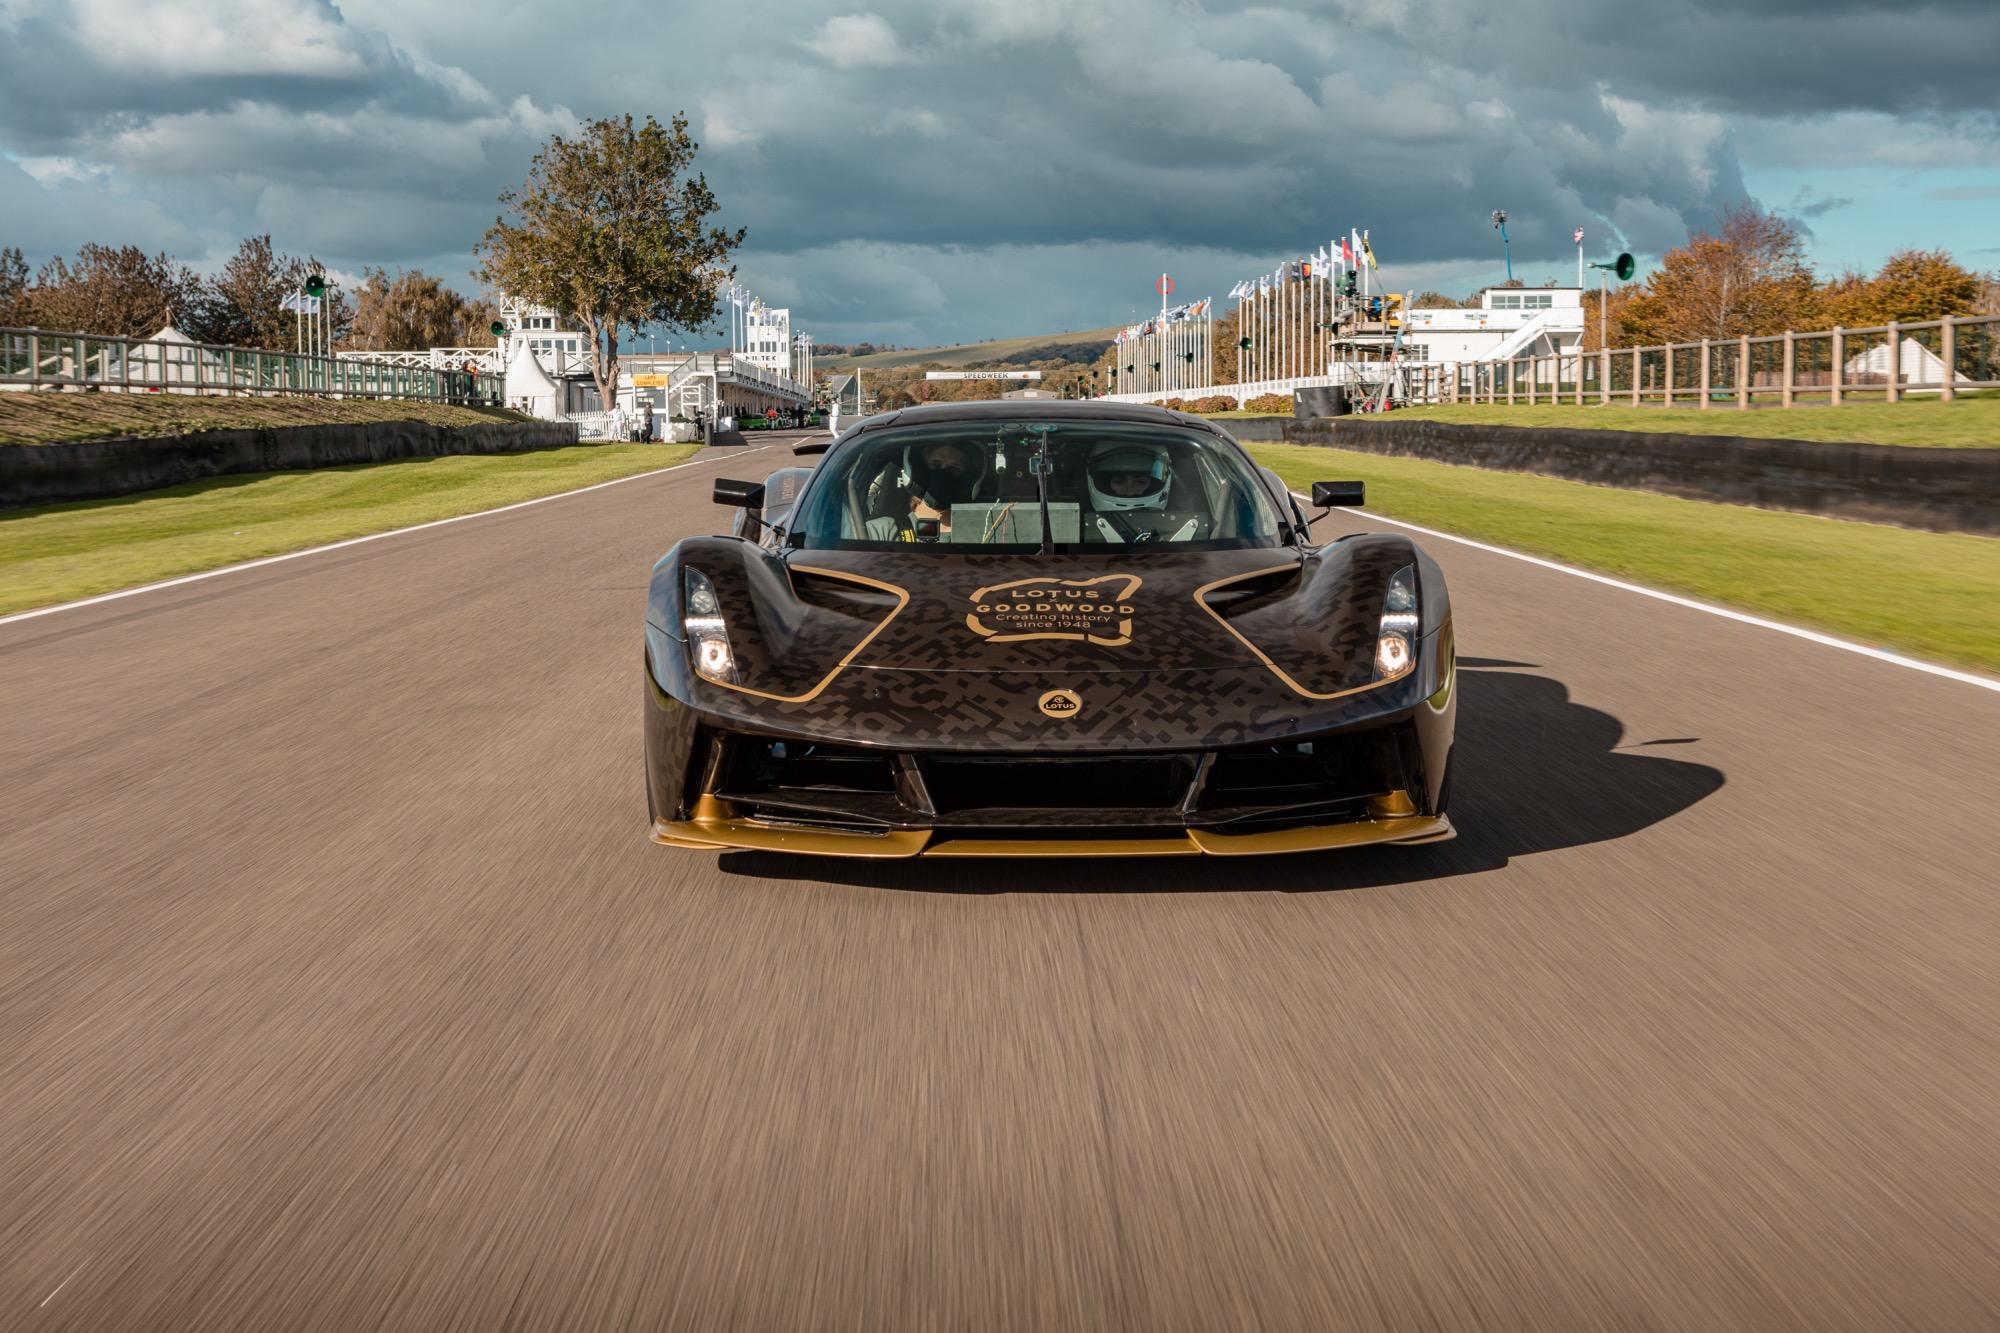 Lotus Evija / Goodwood SpeedWeek